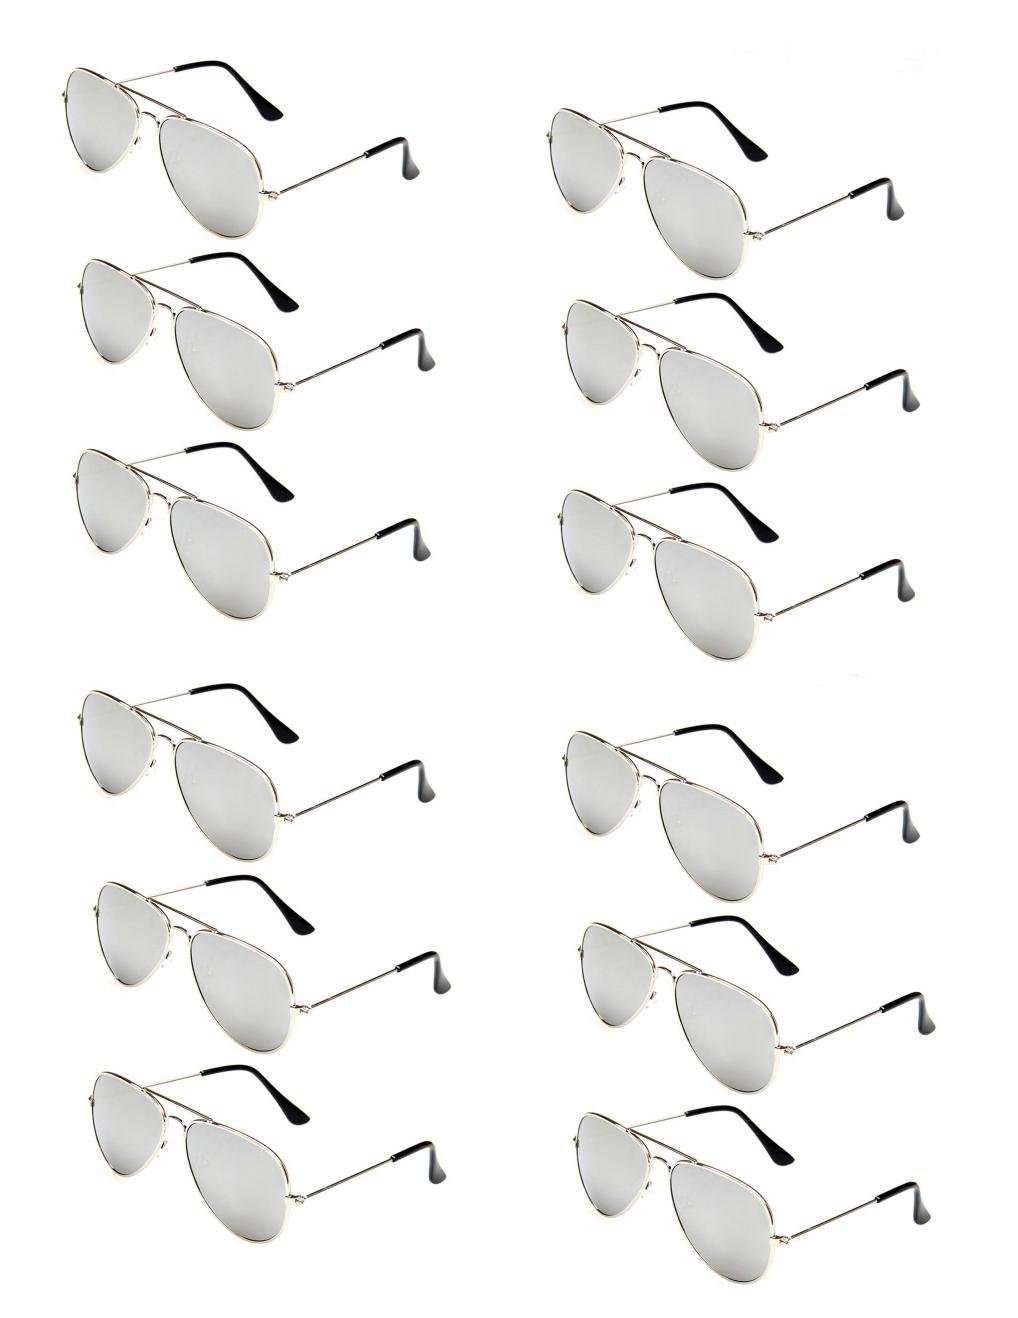 WODISON Classic Kids Aviator Sunglasses Bulk Metal Frame Children Party Eyeglasses 12 Packs JF Store